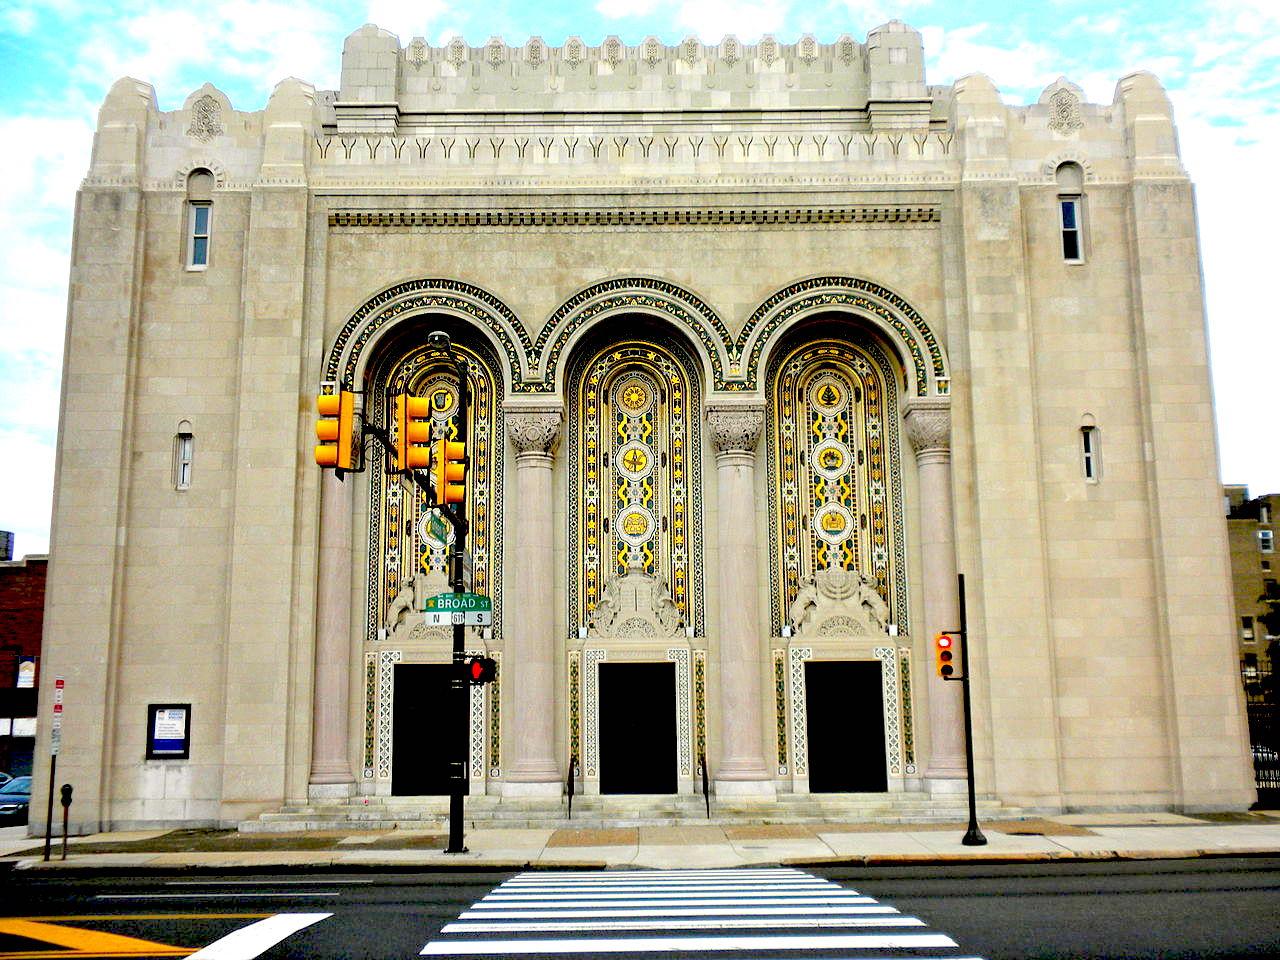 Rodeph Shalom Synagogue in Philadelphia